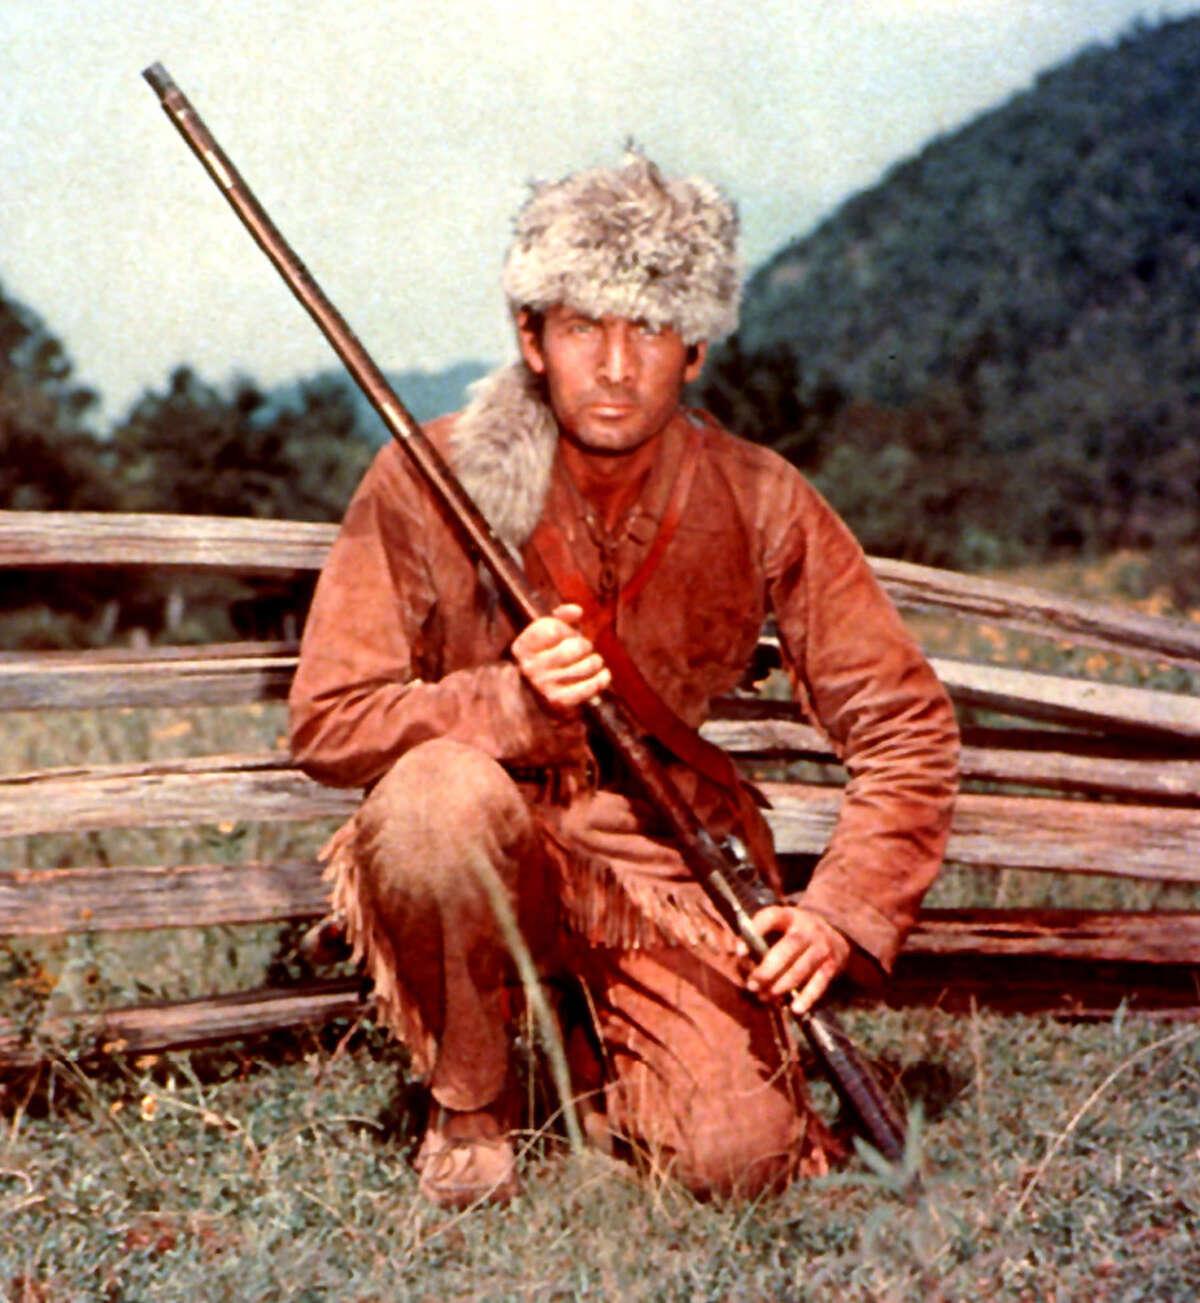 Fess Parker as Davy Crockett in the 1950s.